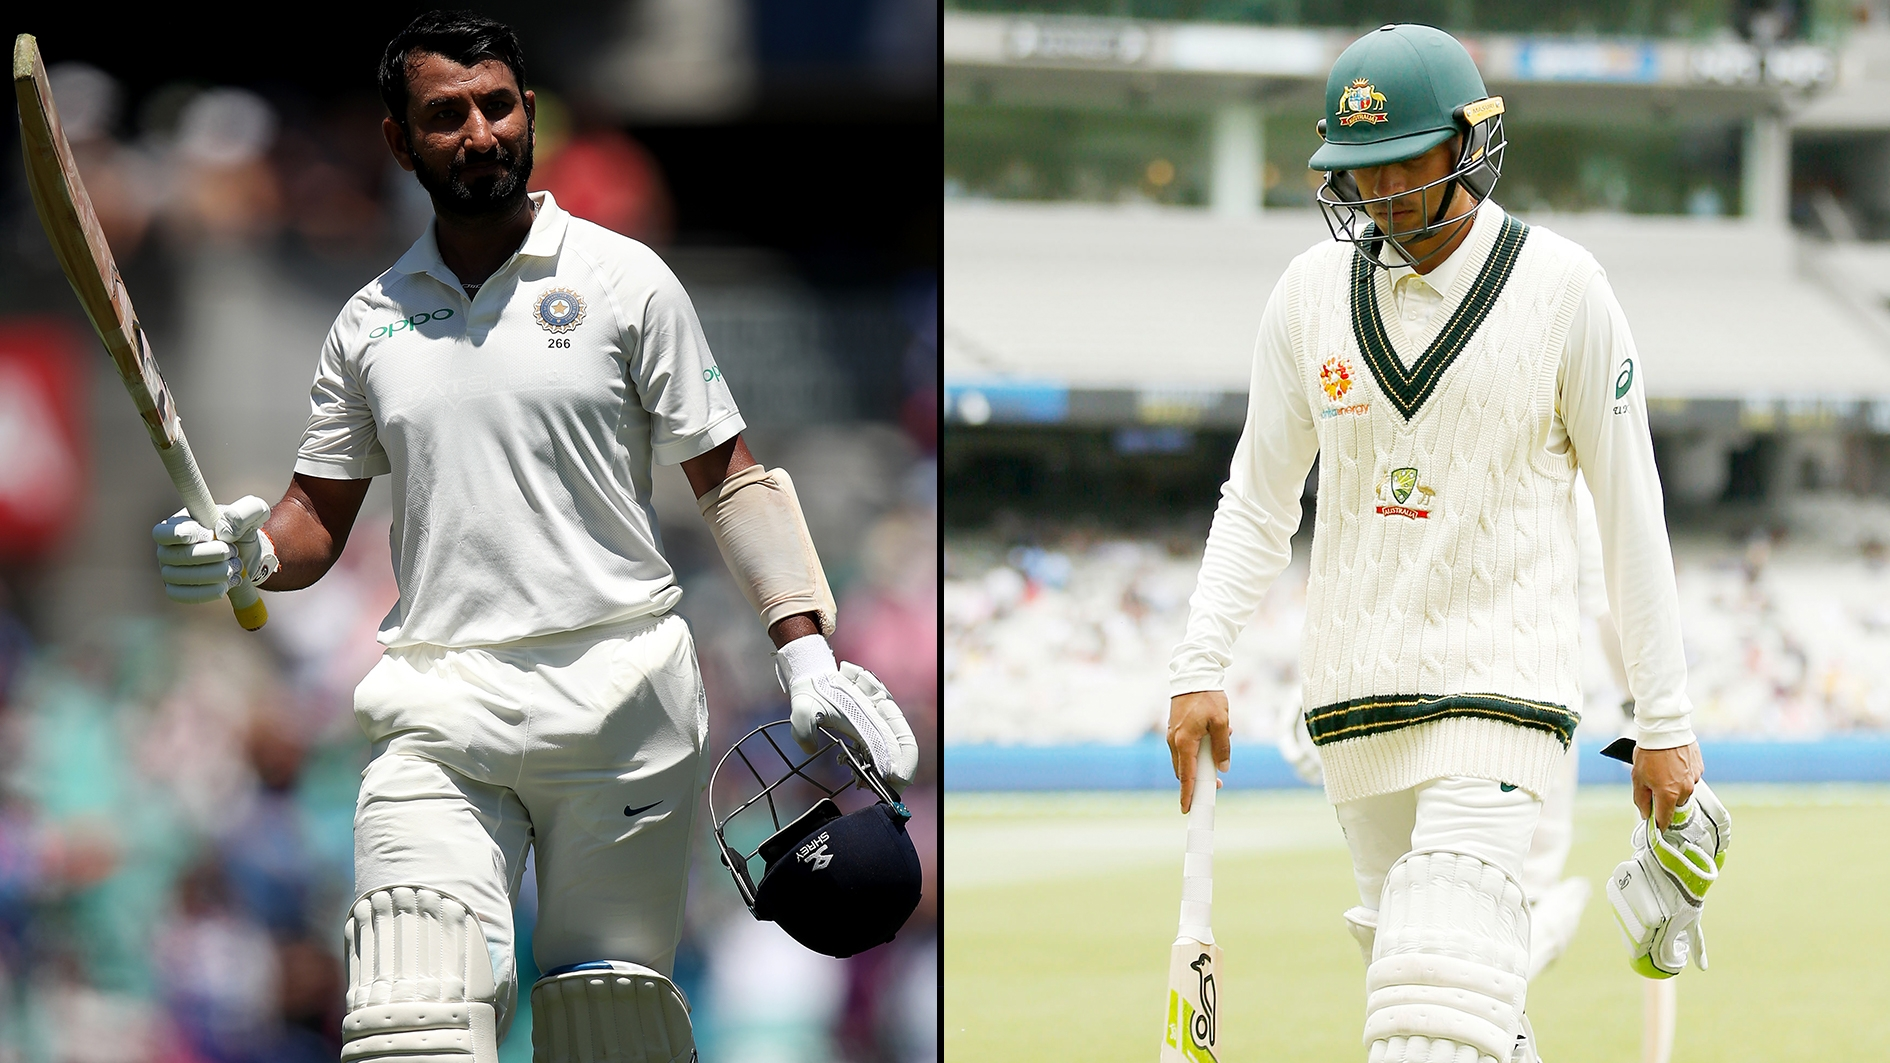 Match drawn - Australia vs India 4th Test Match Summary